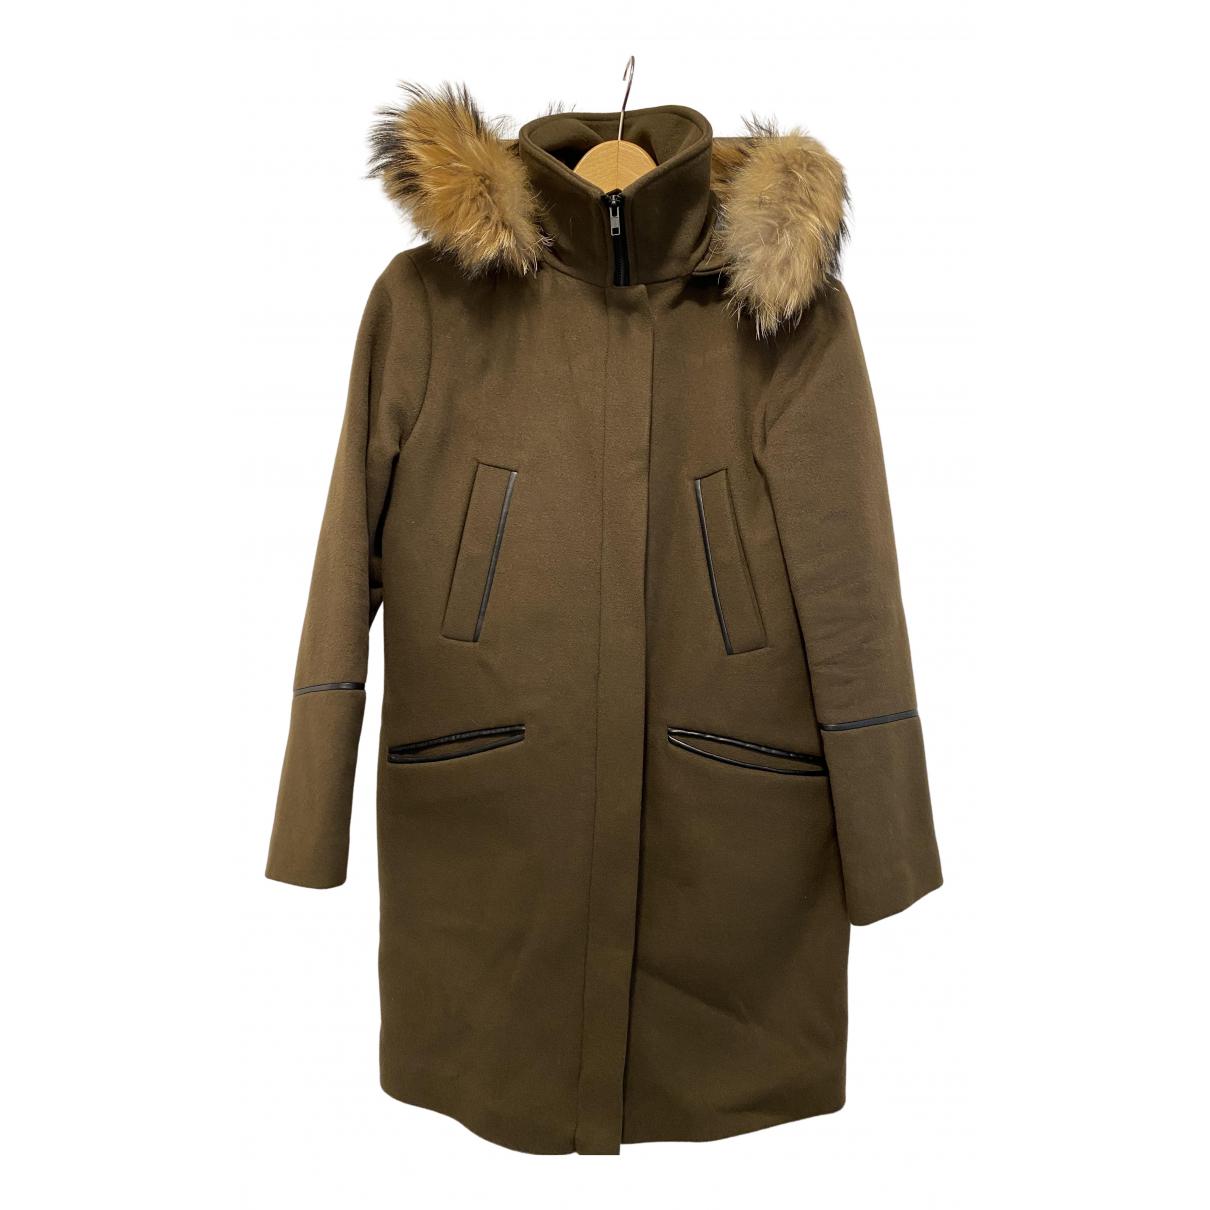 Soia & Kyo - Manteau   pour femme en laine - kaki